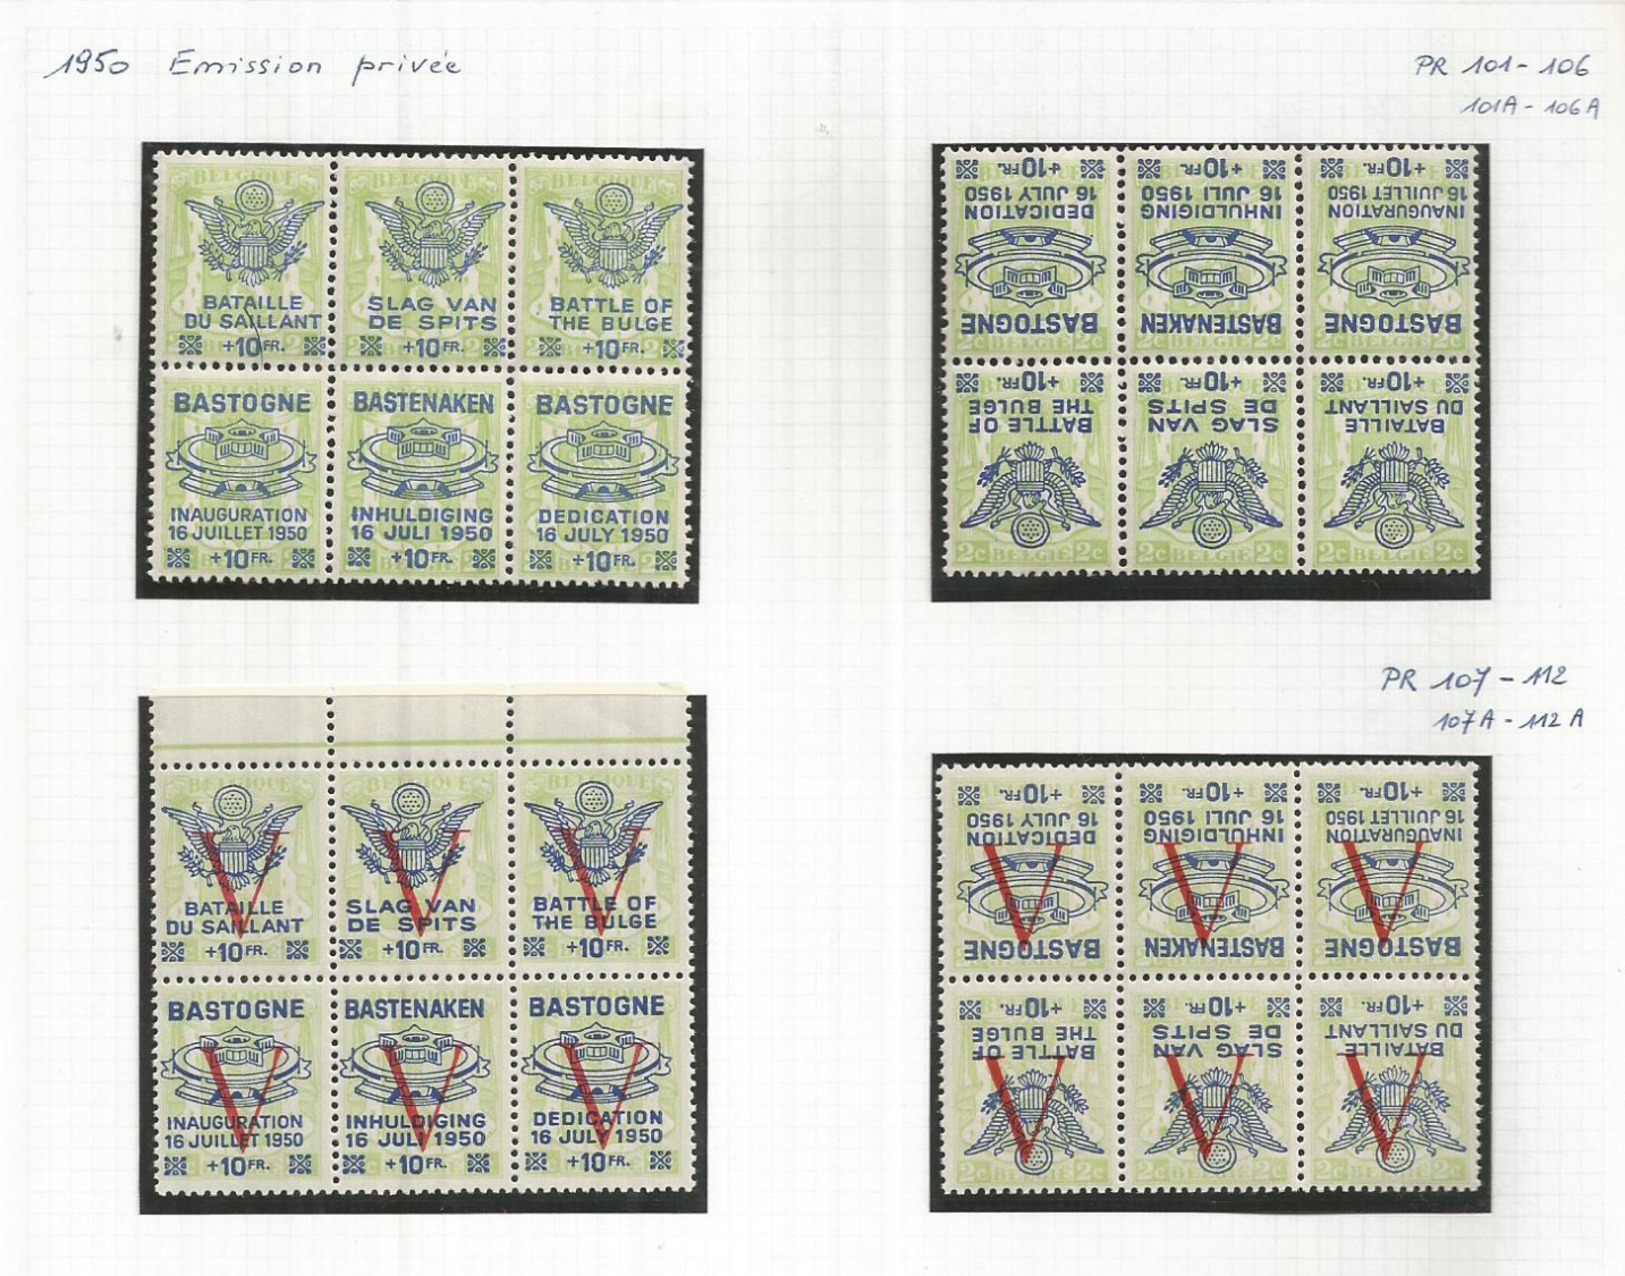 "1945 - COB 101 à 112 + 101 à 112 A + 129 à 132 + 131/132 Surch. Renversée  ""PETITS SCEAUX De L'ETAT"" **(MNH) - Posta Privata & Locale"